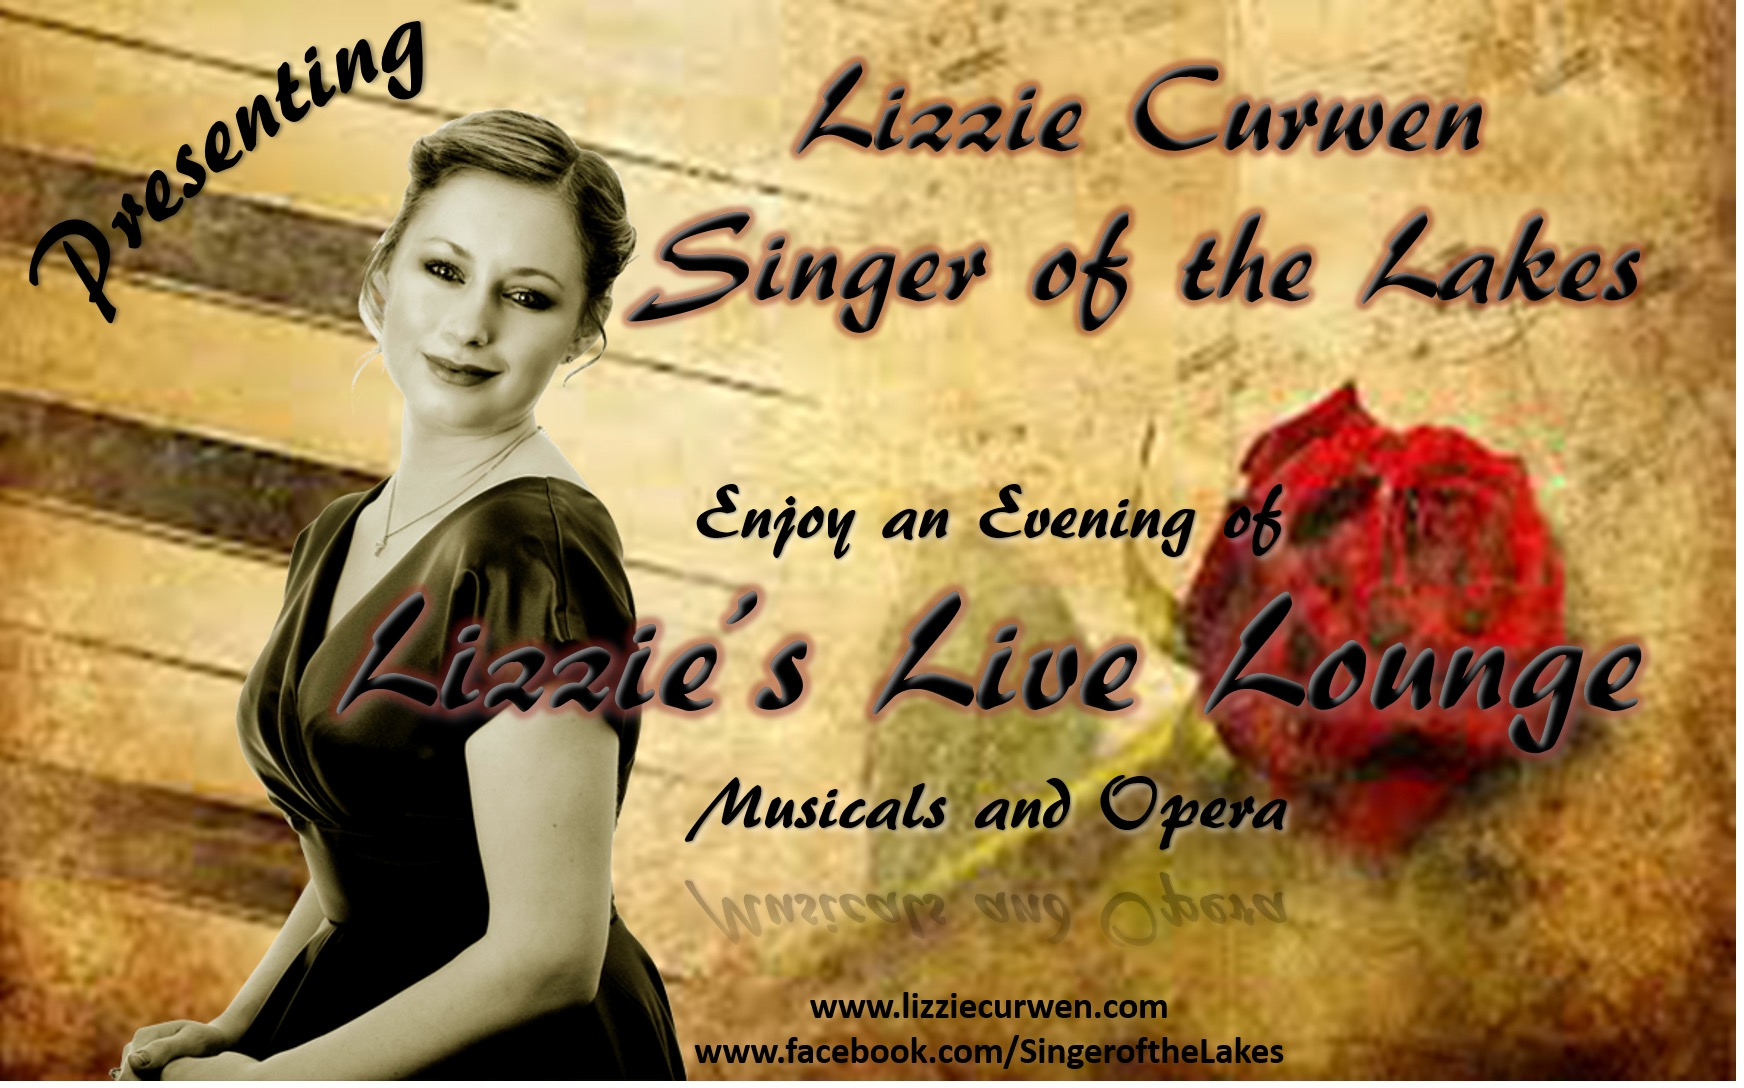 Musicals and Opera